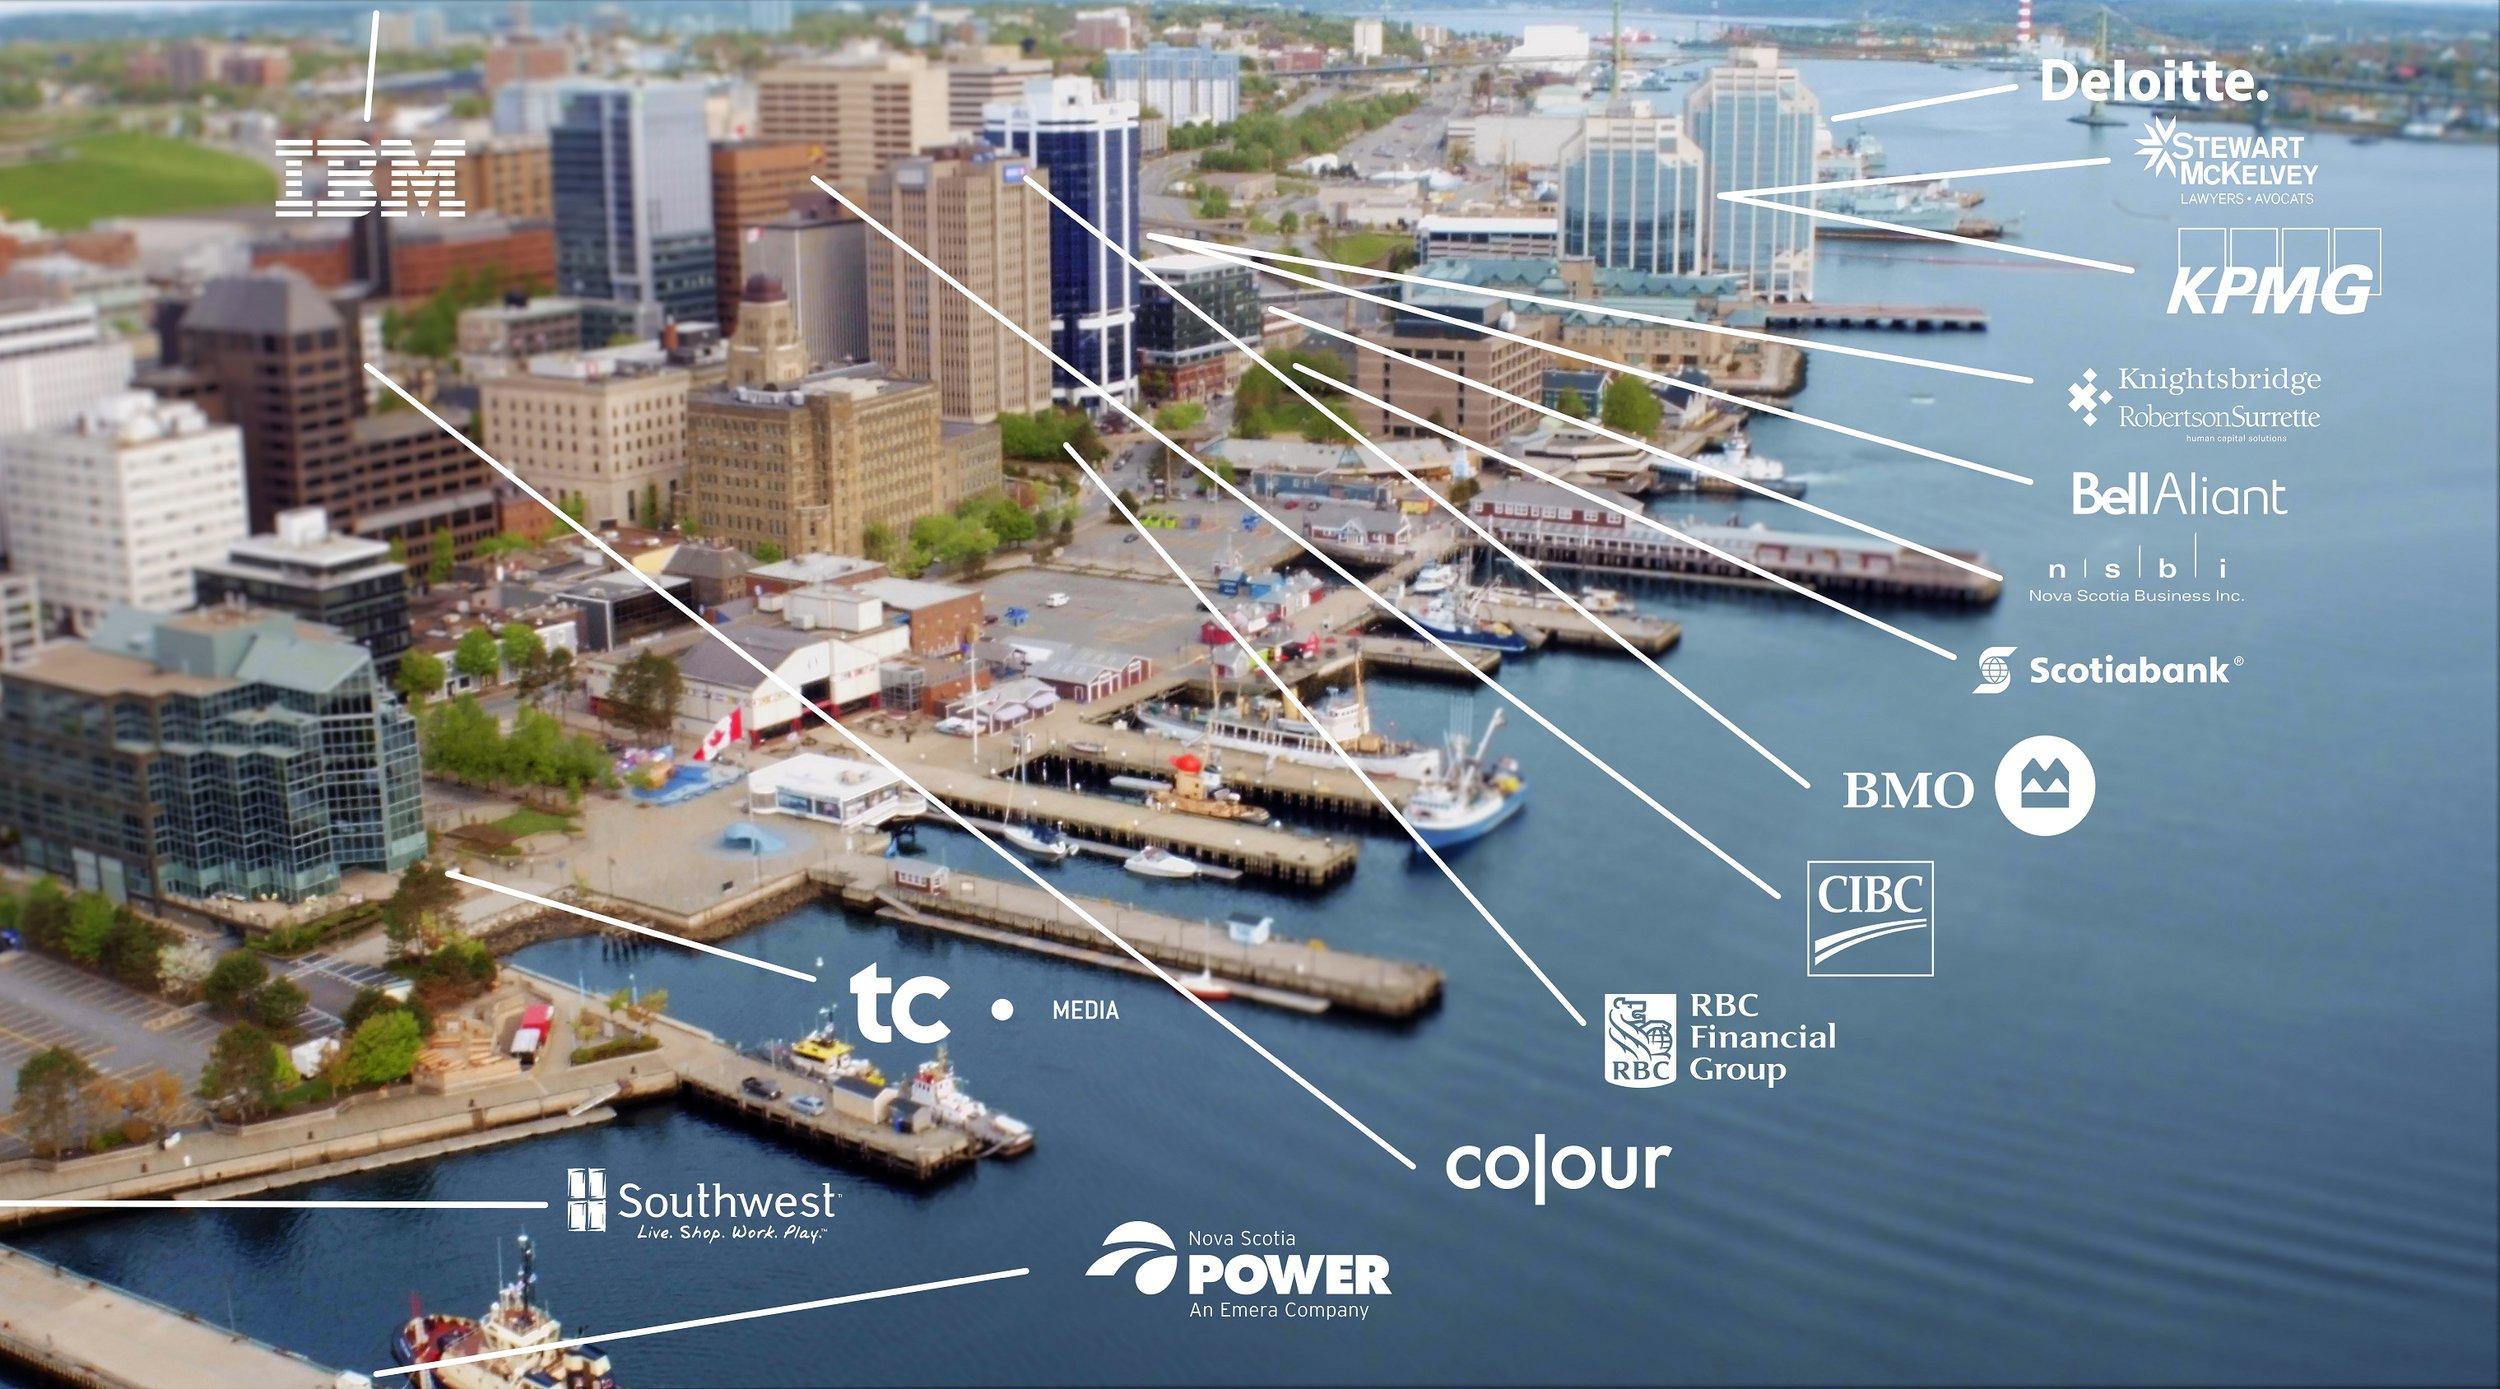 Photo Credit: Halifax Partnership